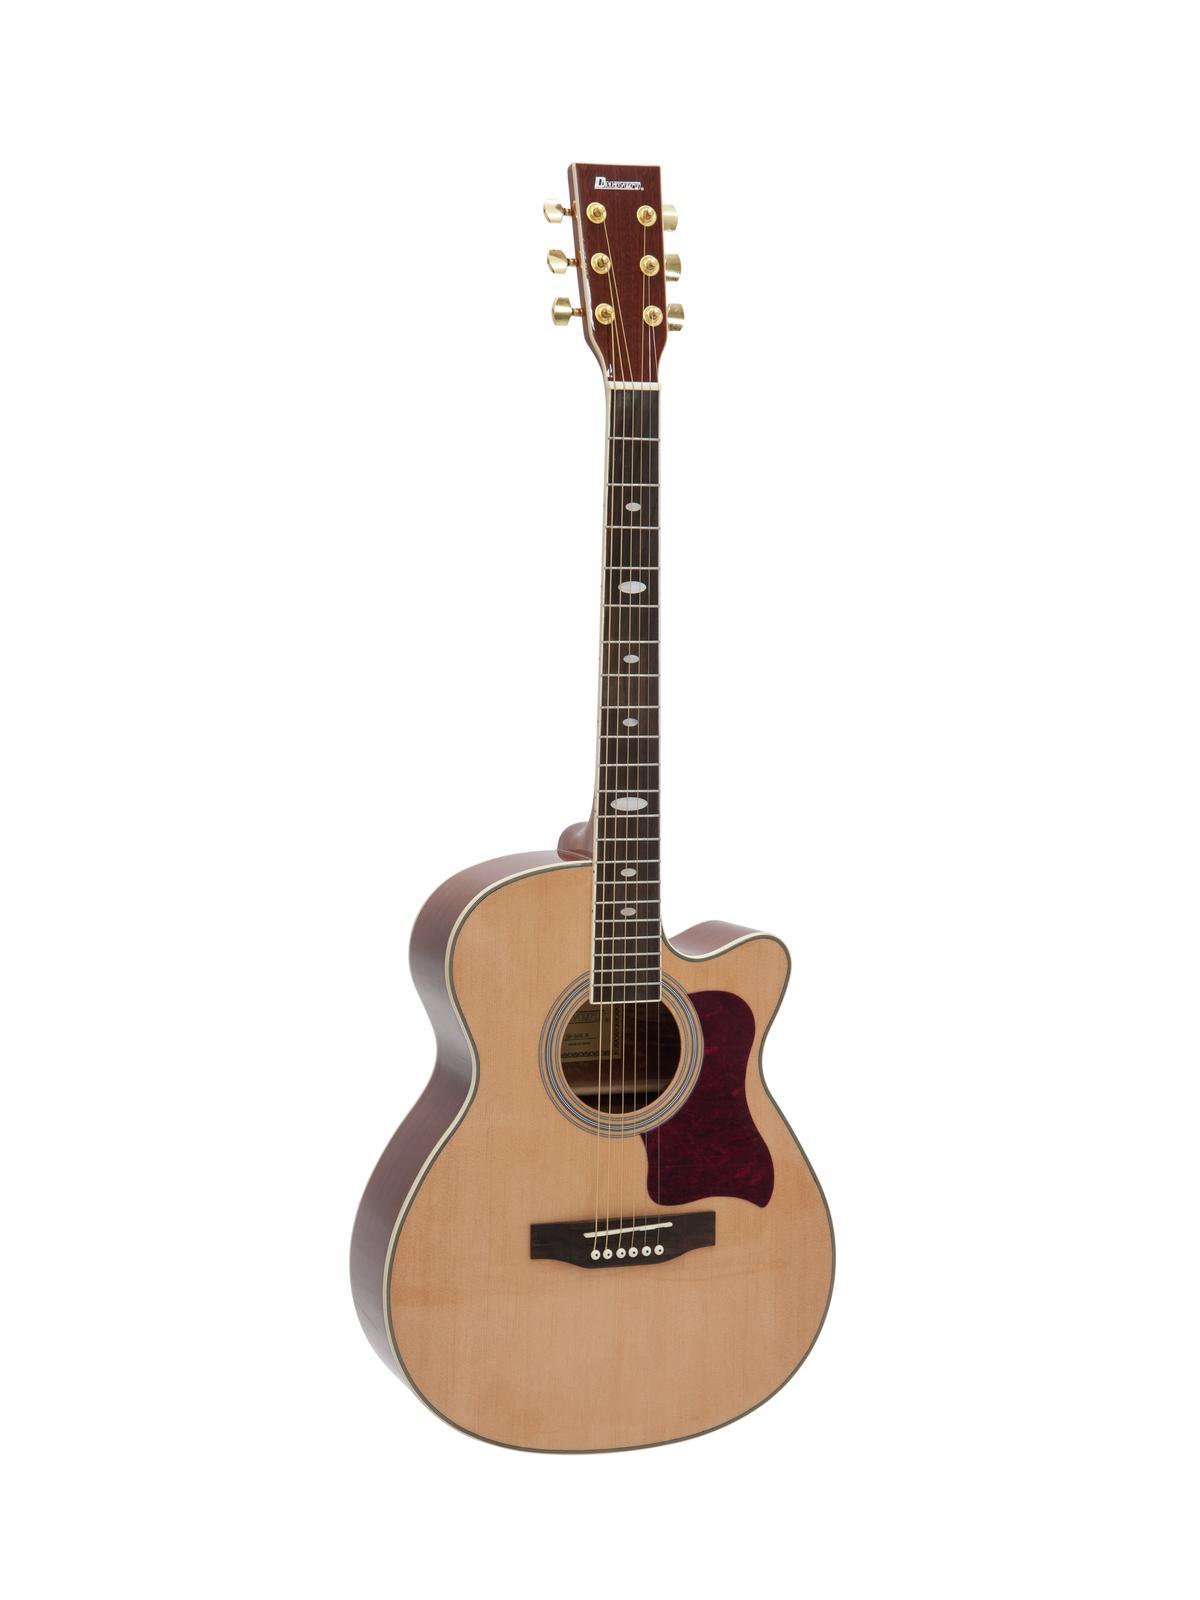 Chitarra acustica, western, colore nature cataway, acero, DIMAVERY JH-500